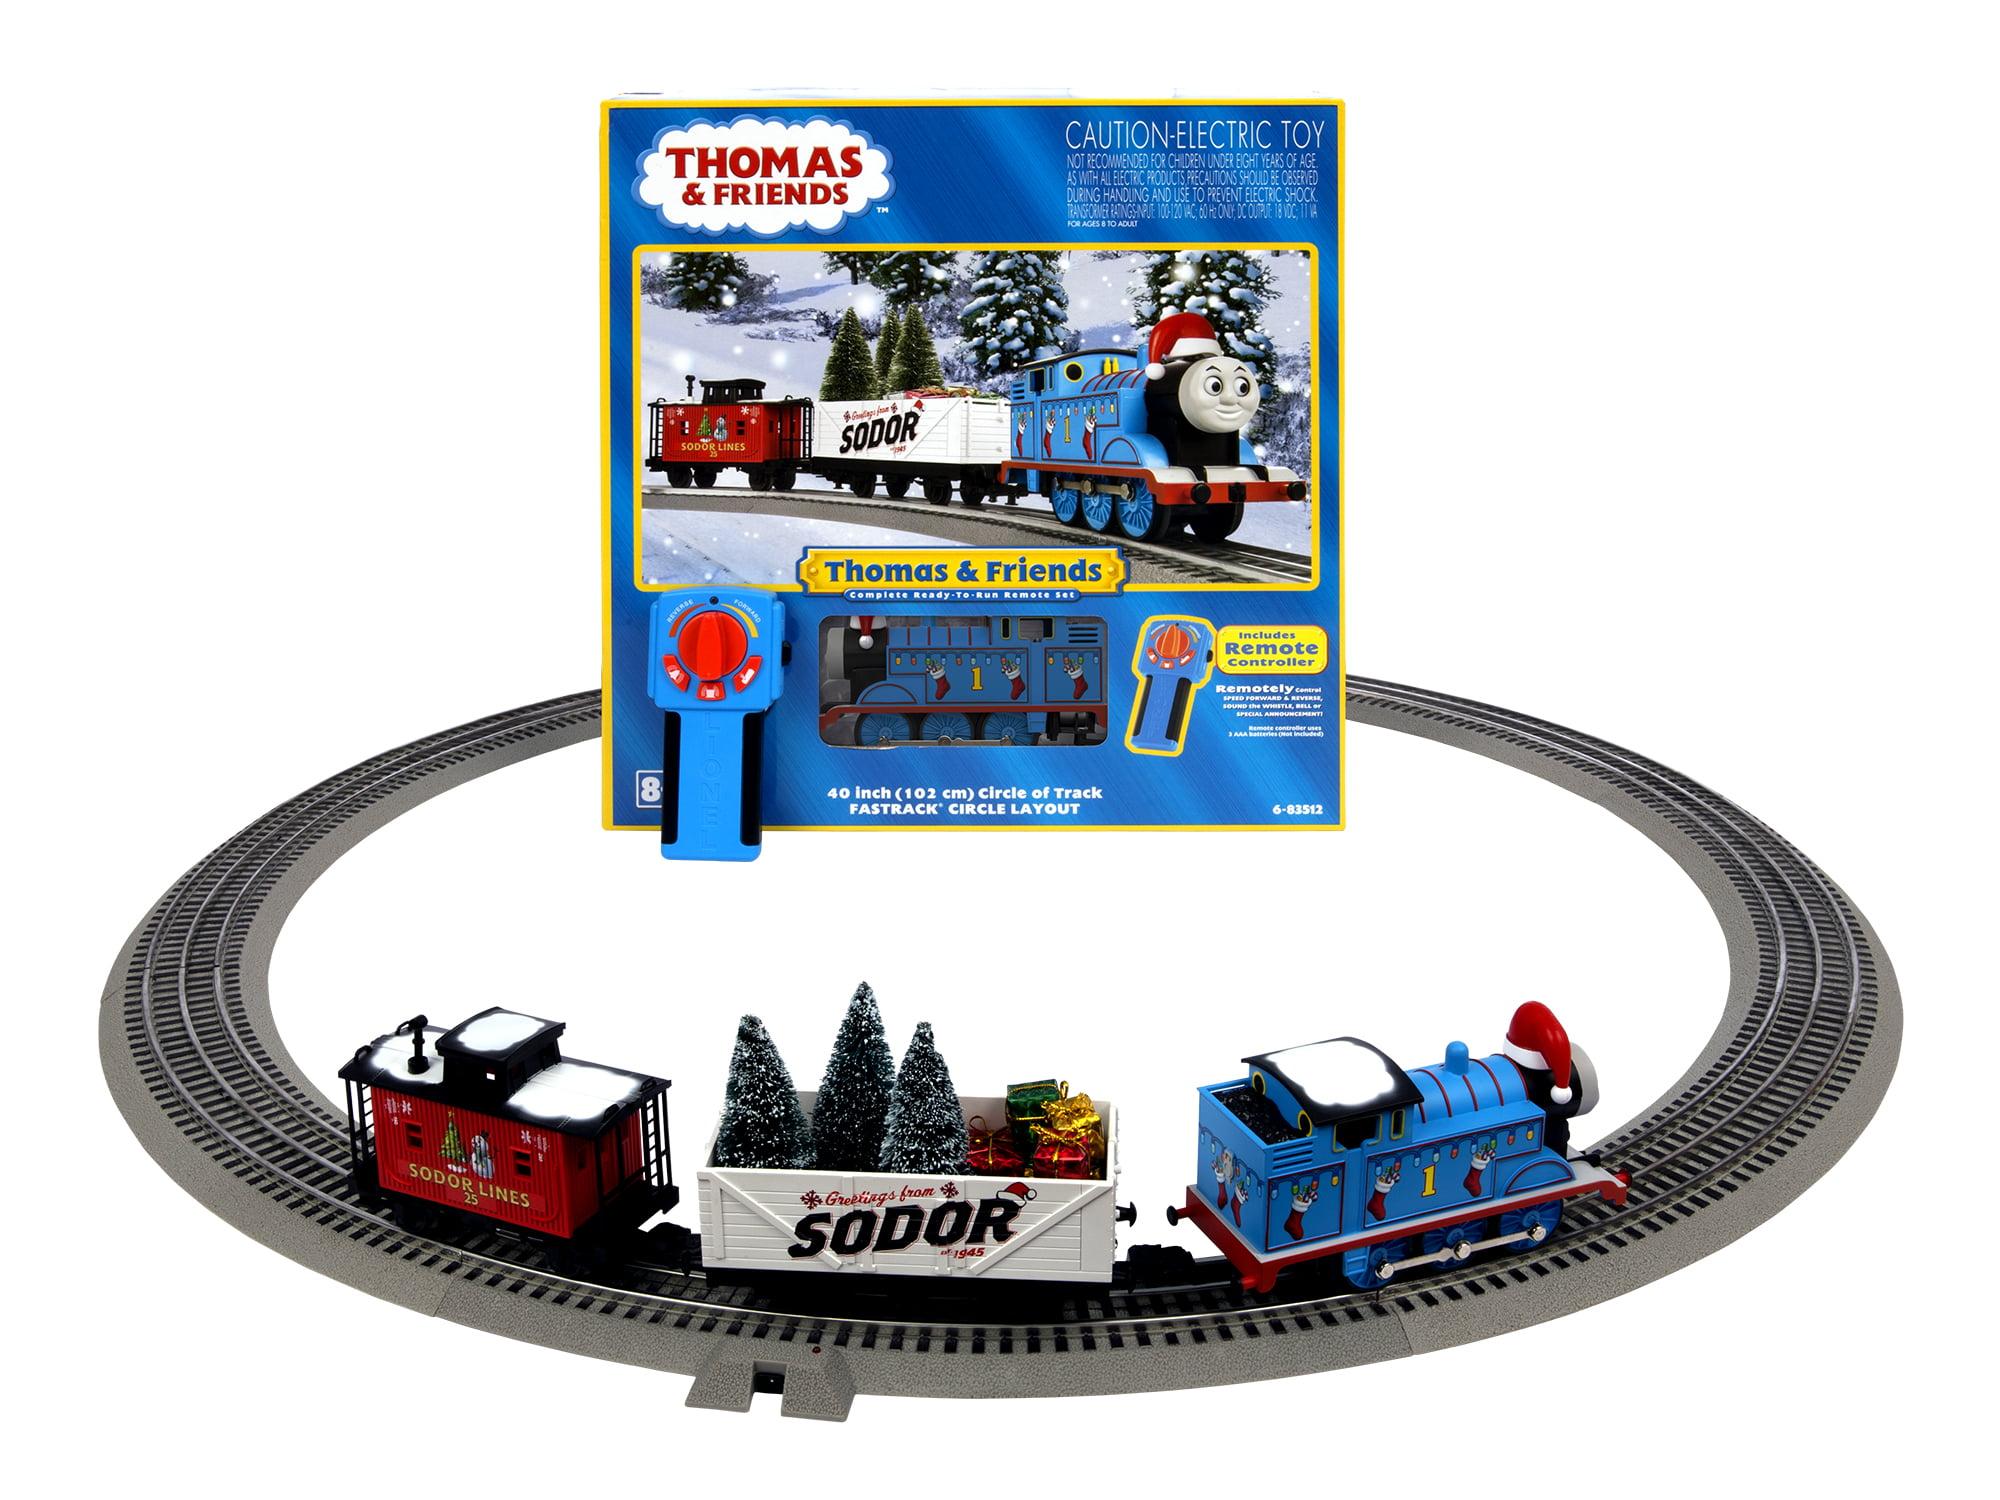 Thomas The Train Christmas Set.Lionel Trains Thomas Christmas Freight O Gauge Ready To Run Train Set